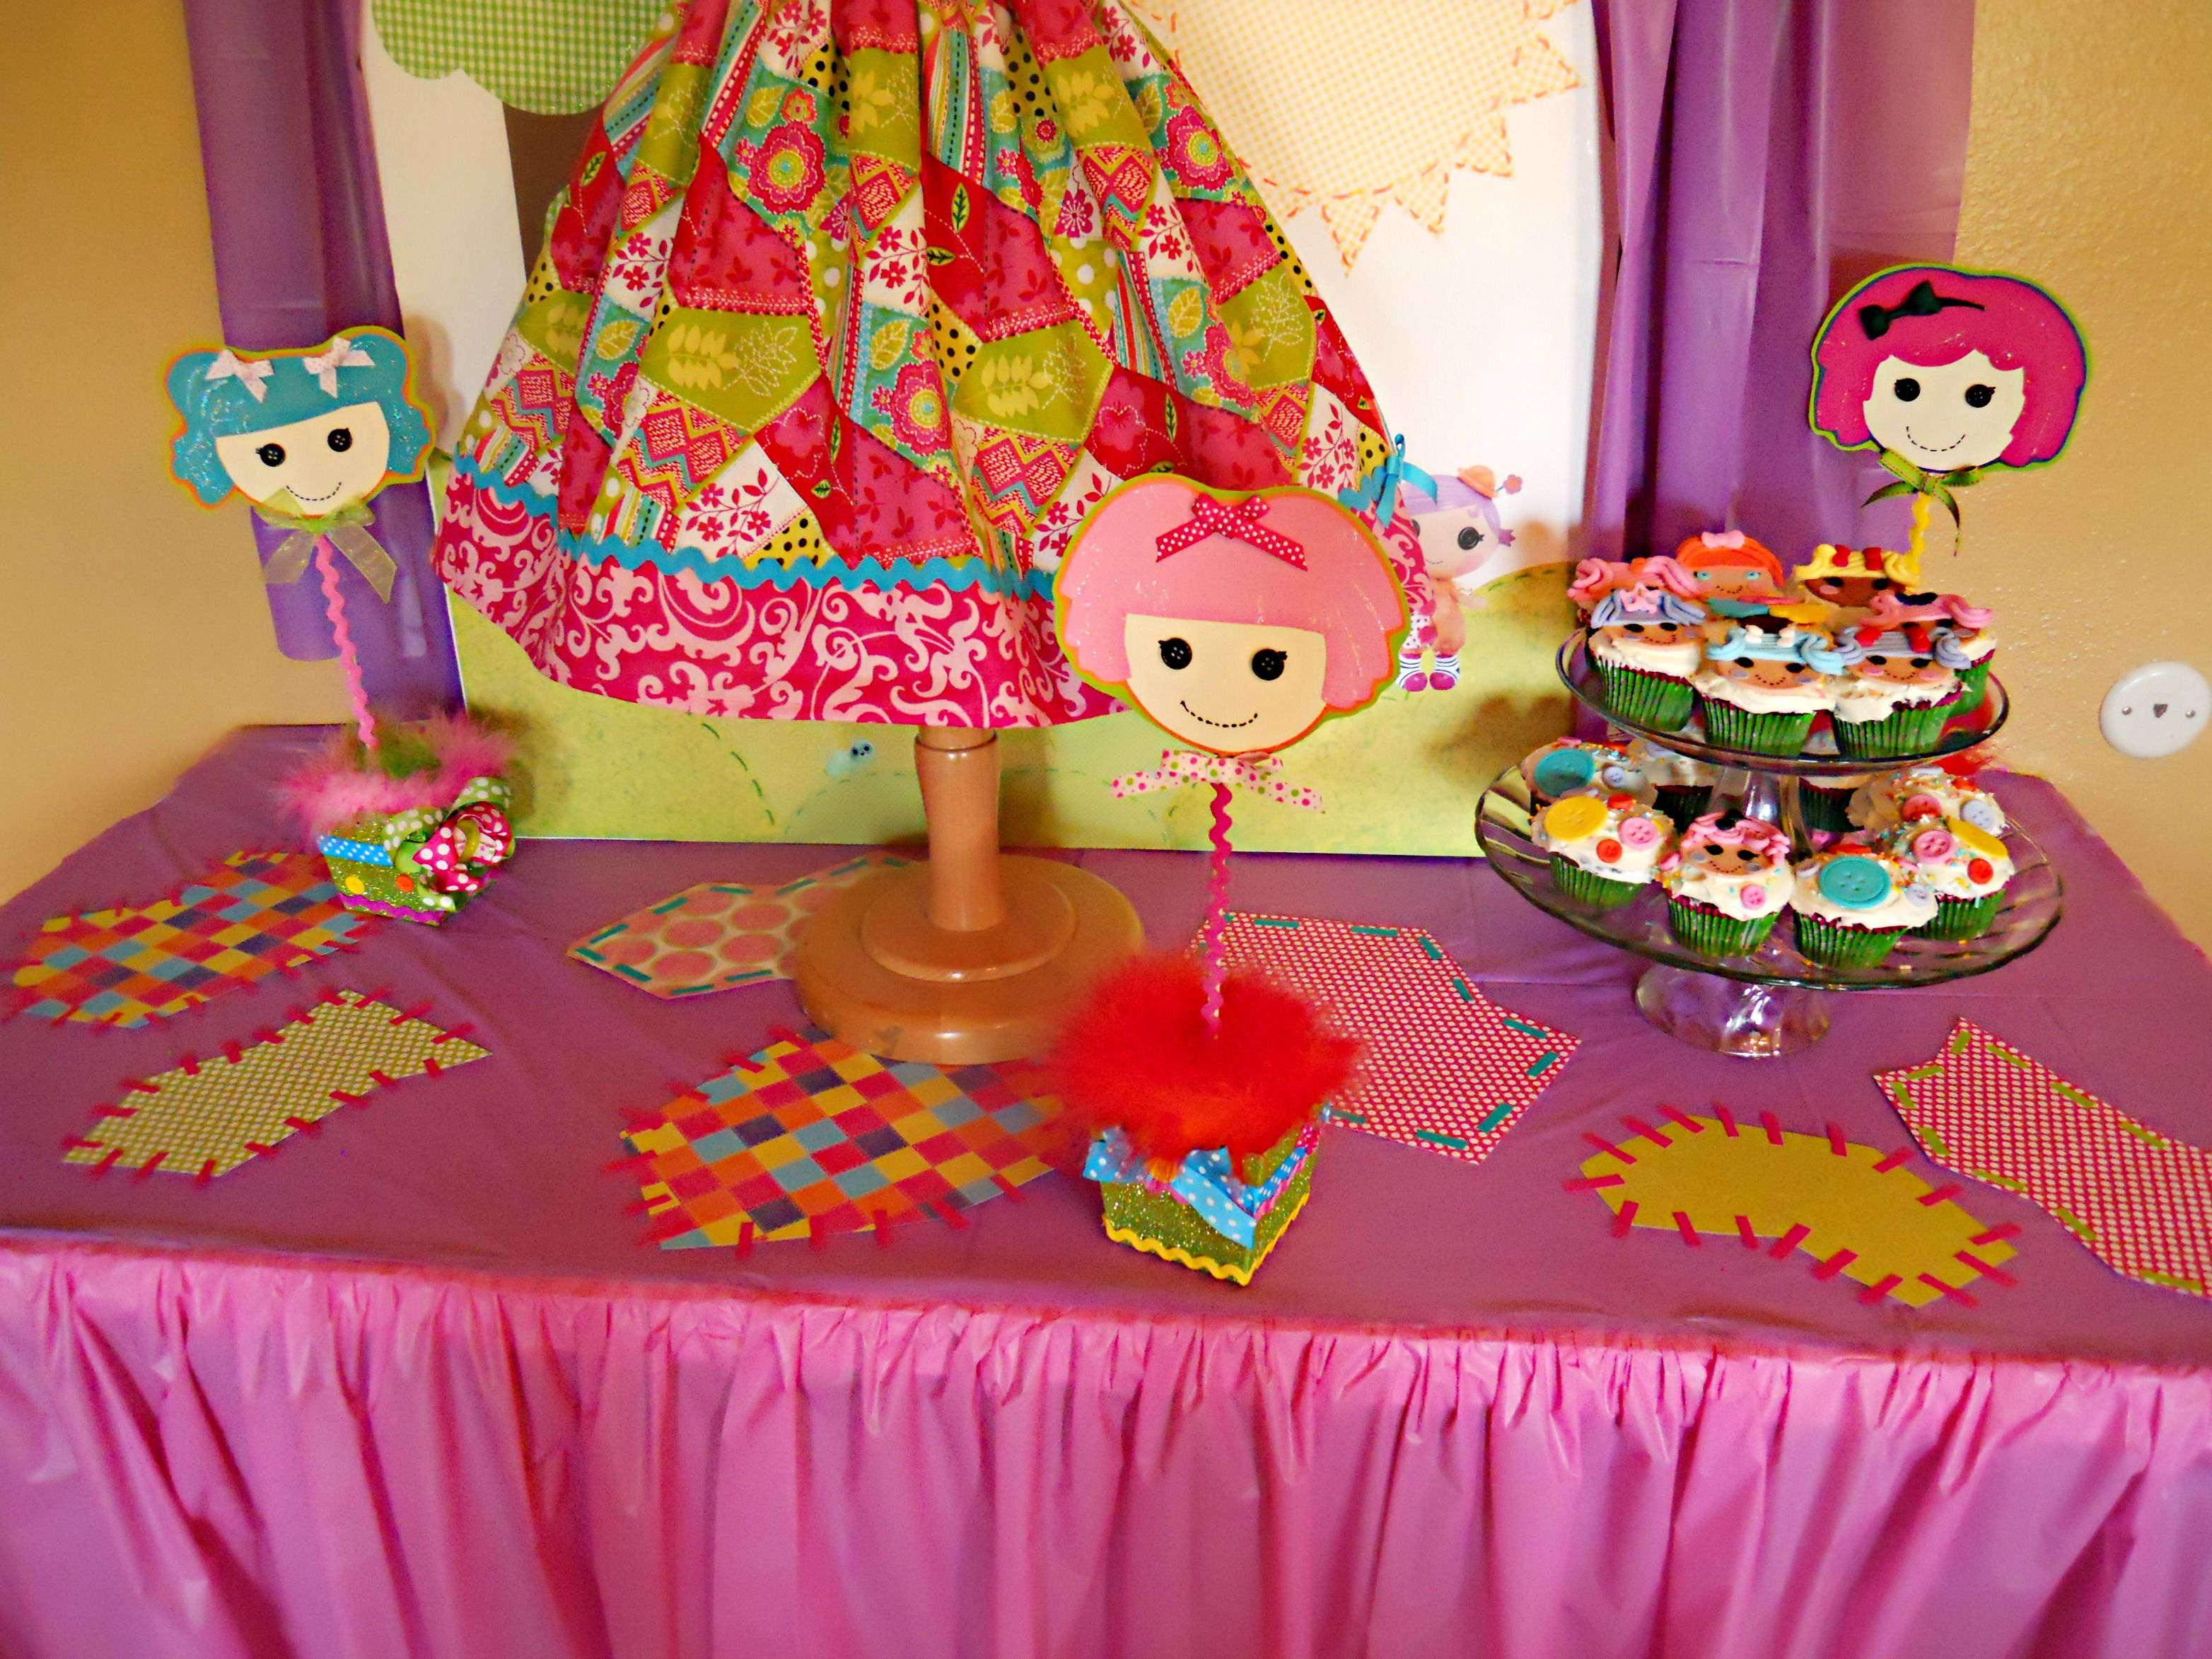 Lalaloopsy birthday table center piece decoration ideas